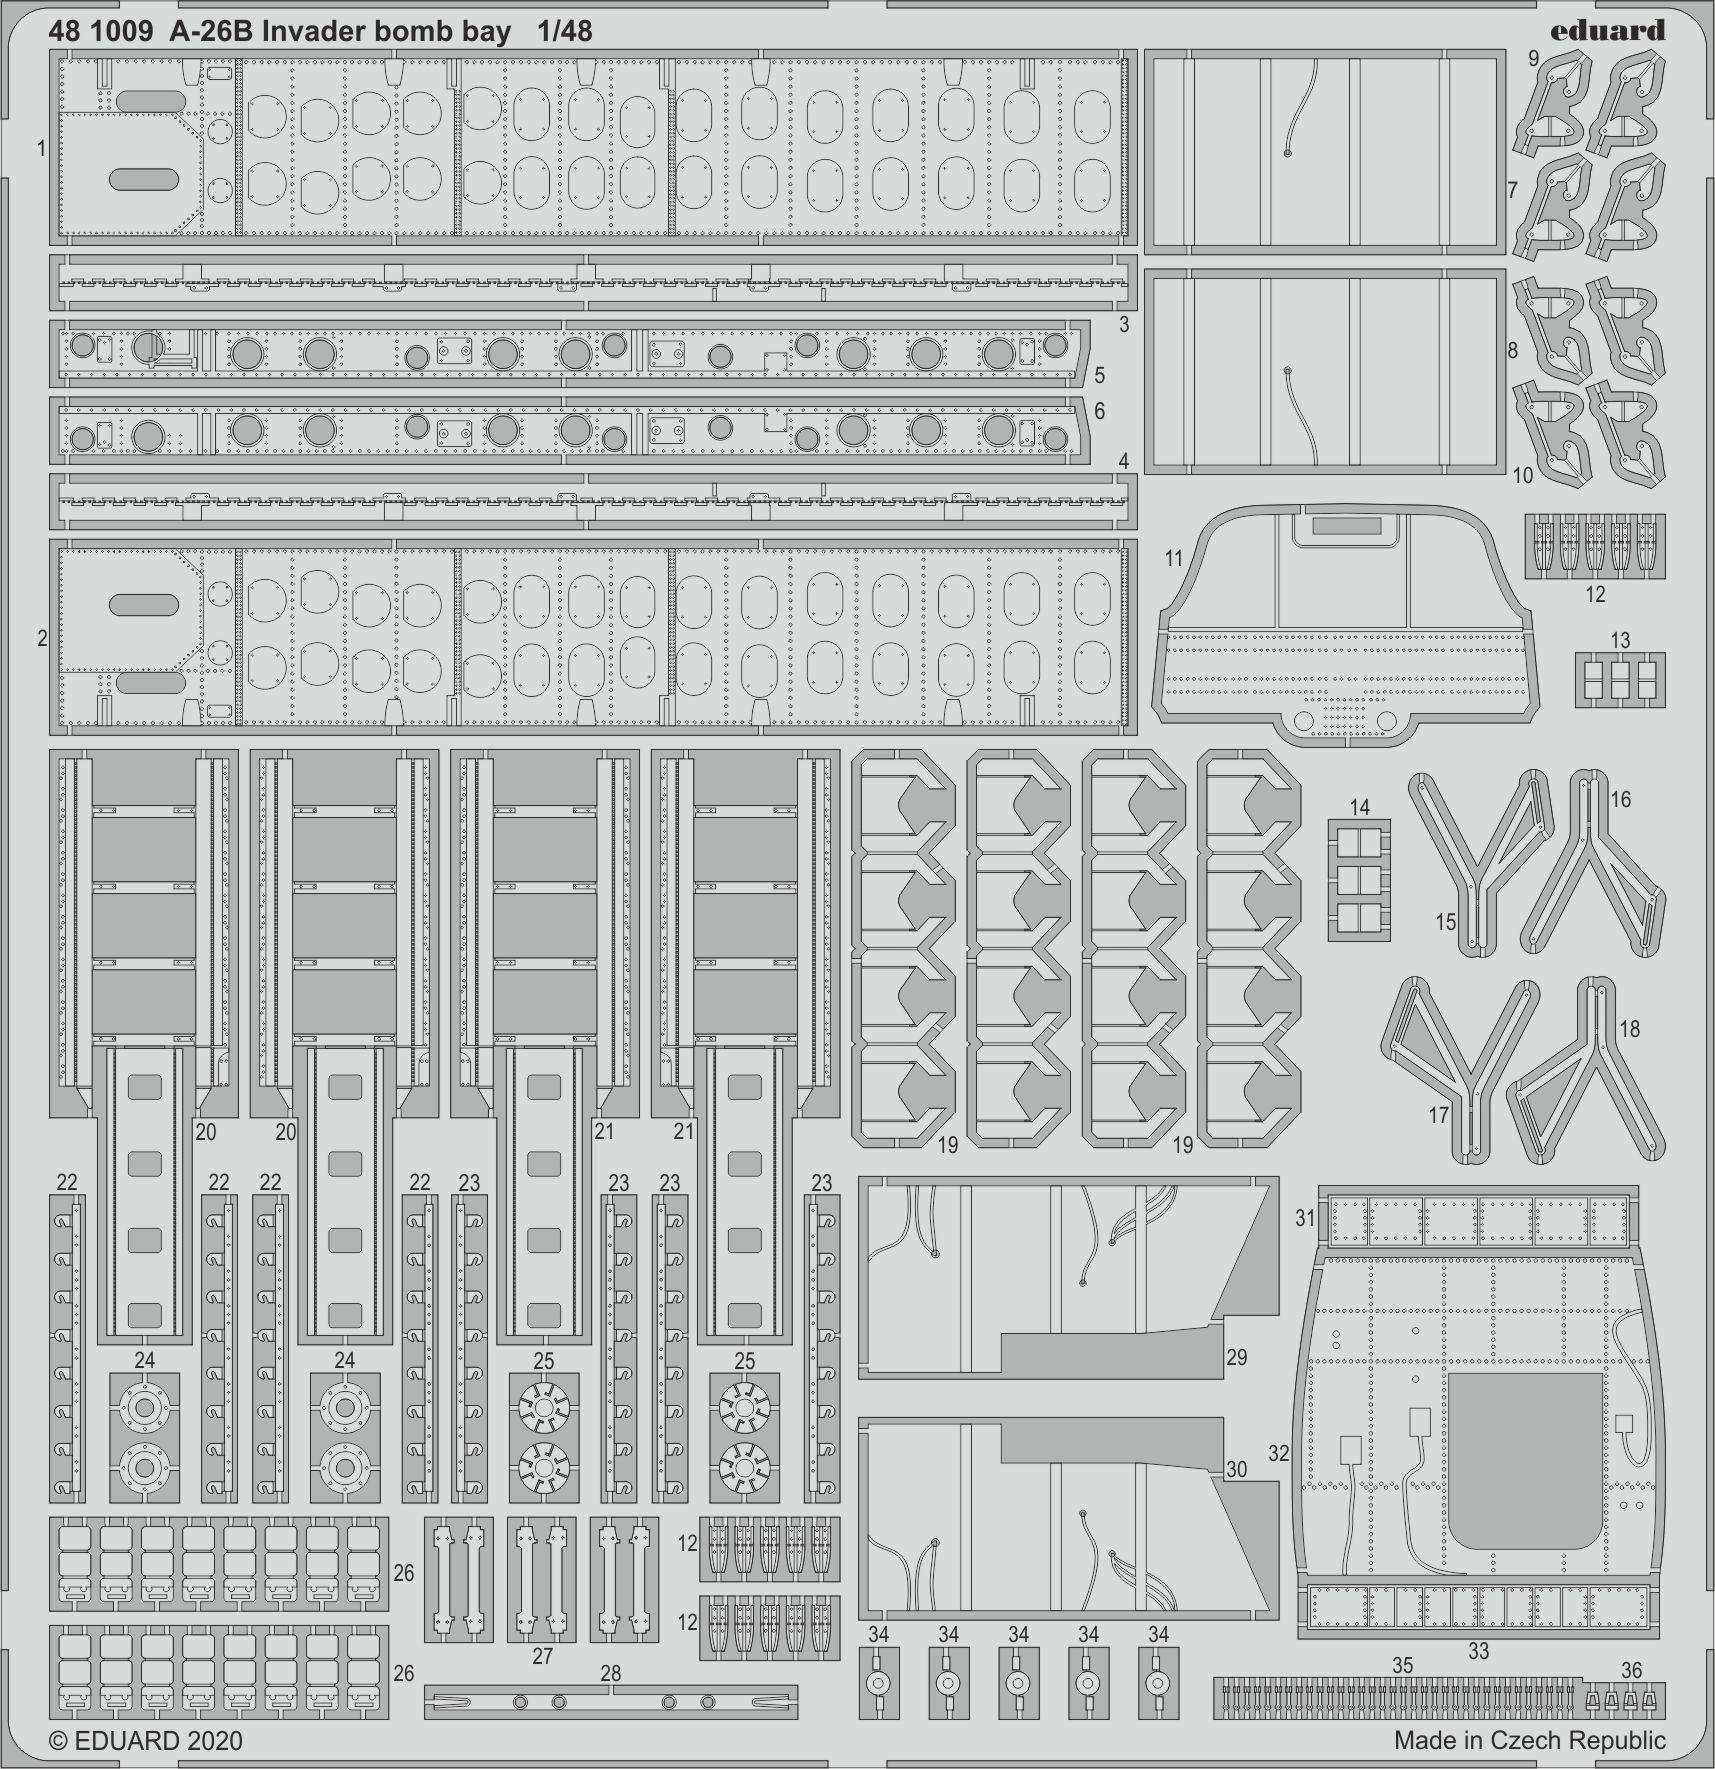 ED481009